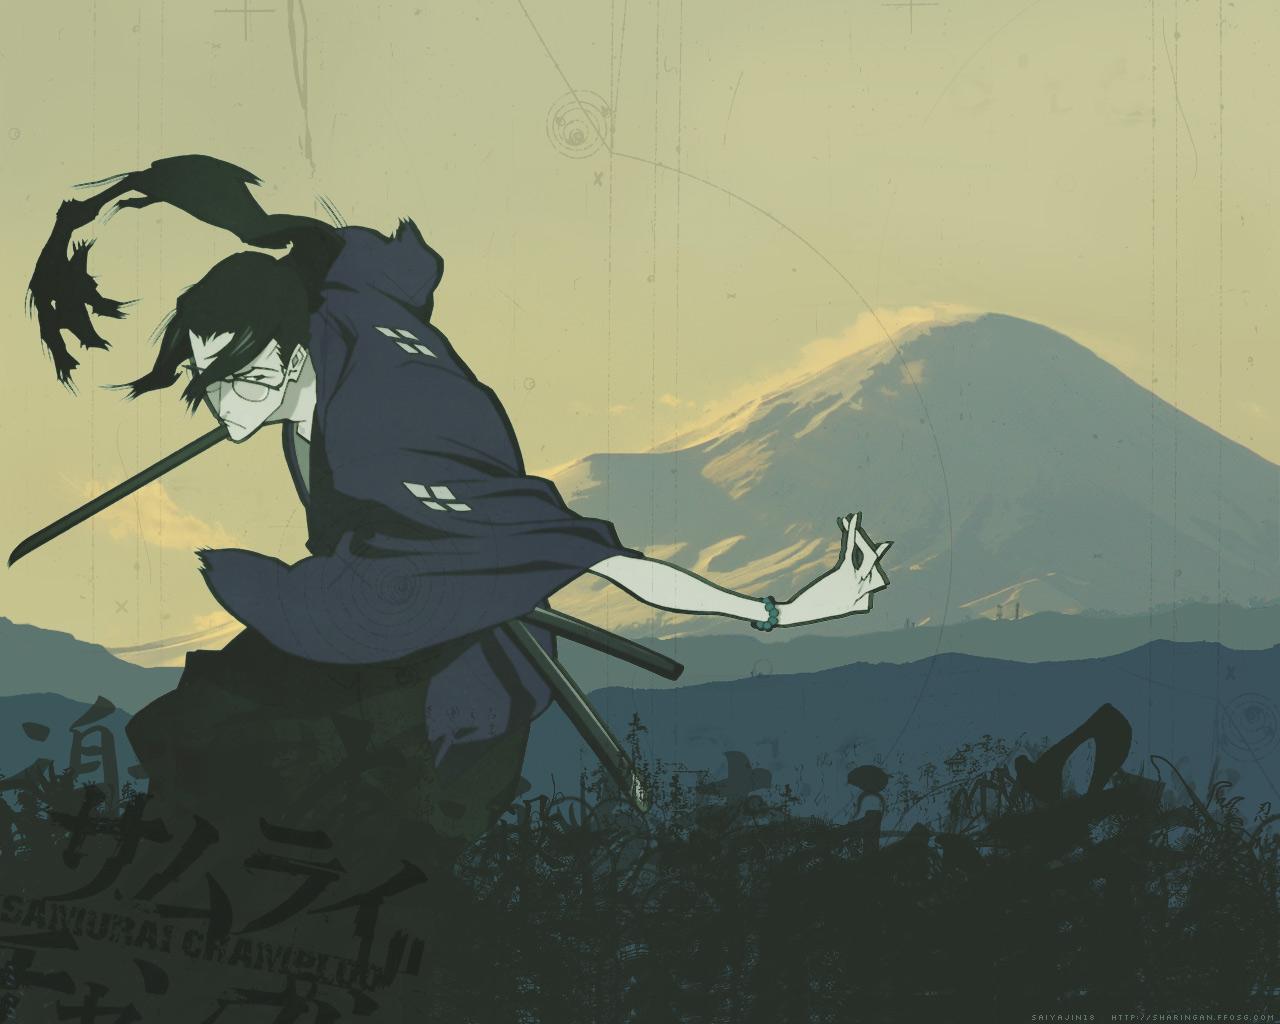 Samurai Champloo Wallpaper: Jin at Fuji - Minitokyo